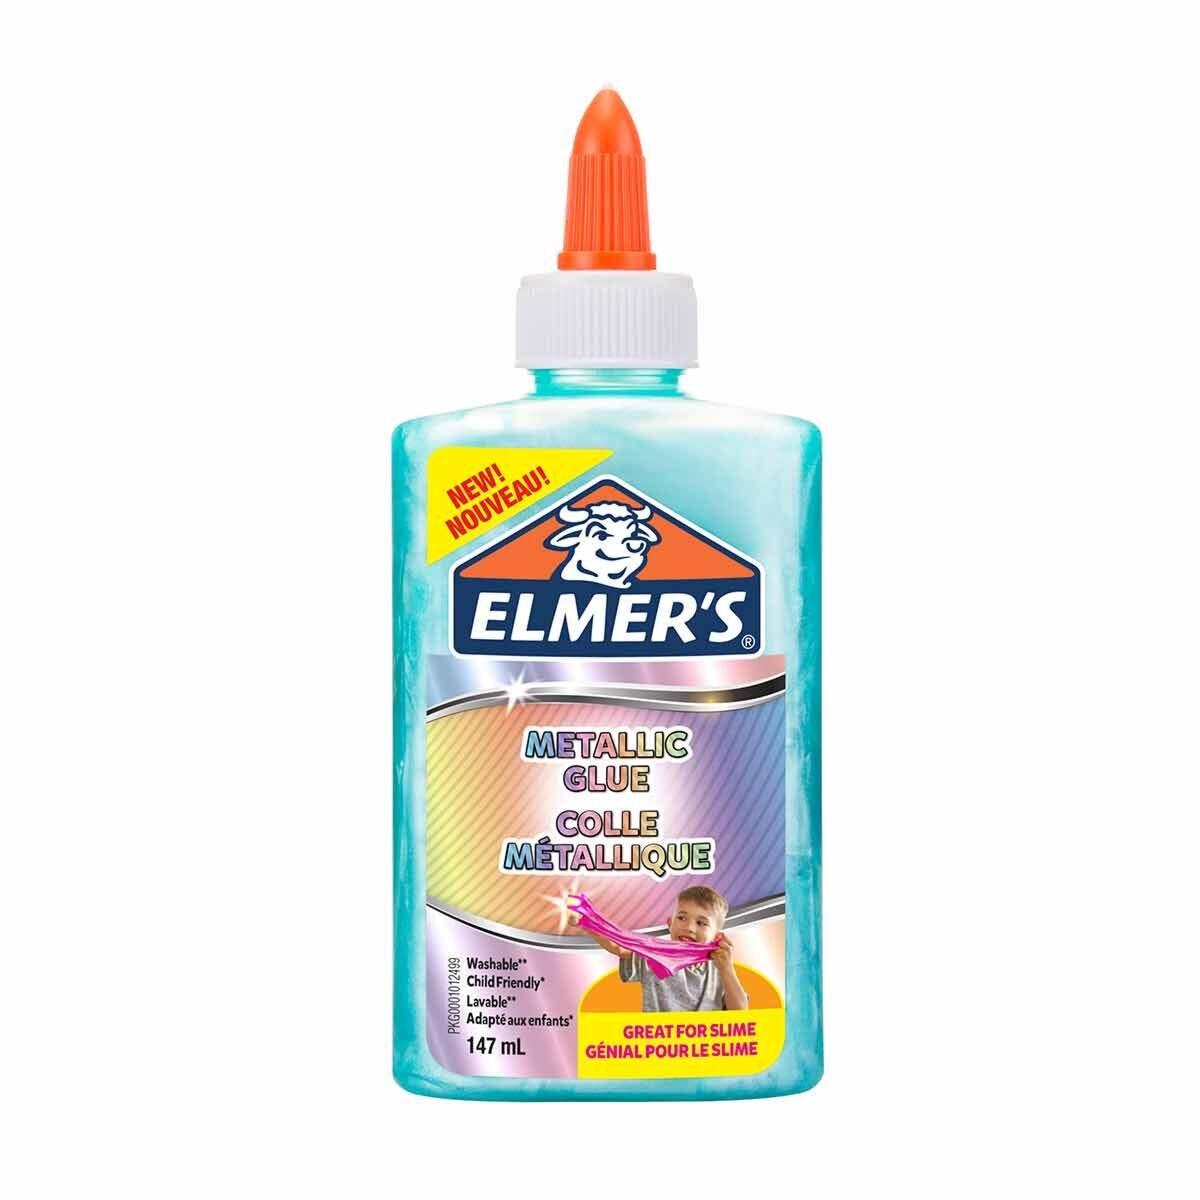 Elmers Metallic Glue 147ml Teal